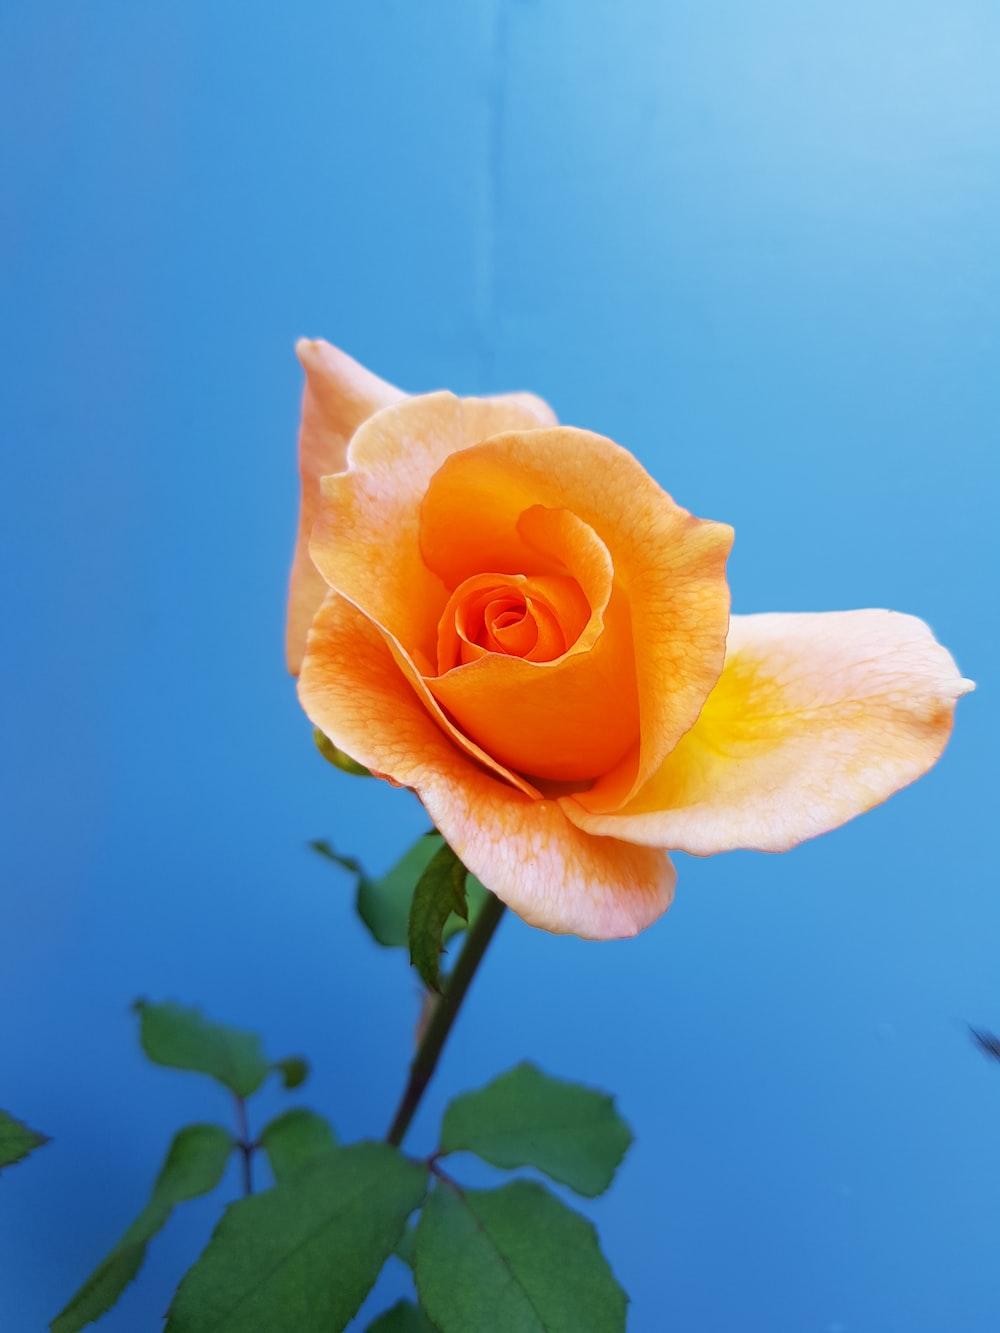 Single Flower Pictures Download Free Images On Unsplash